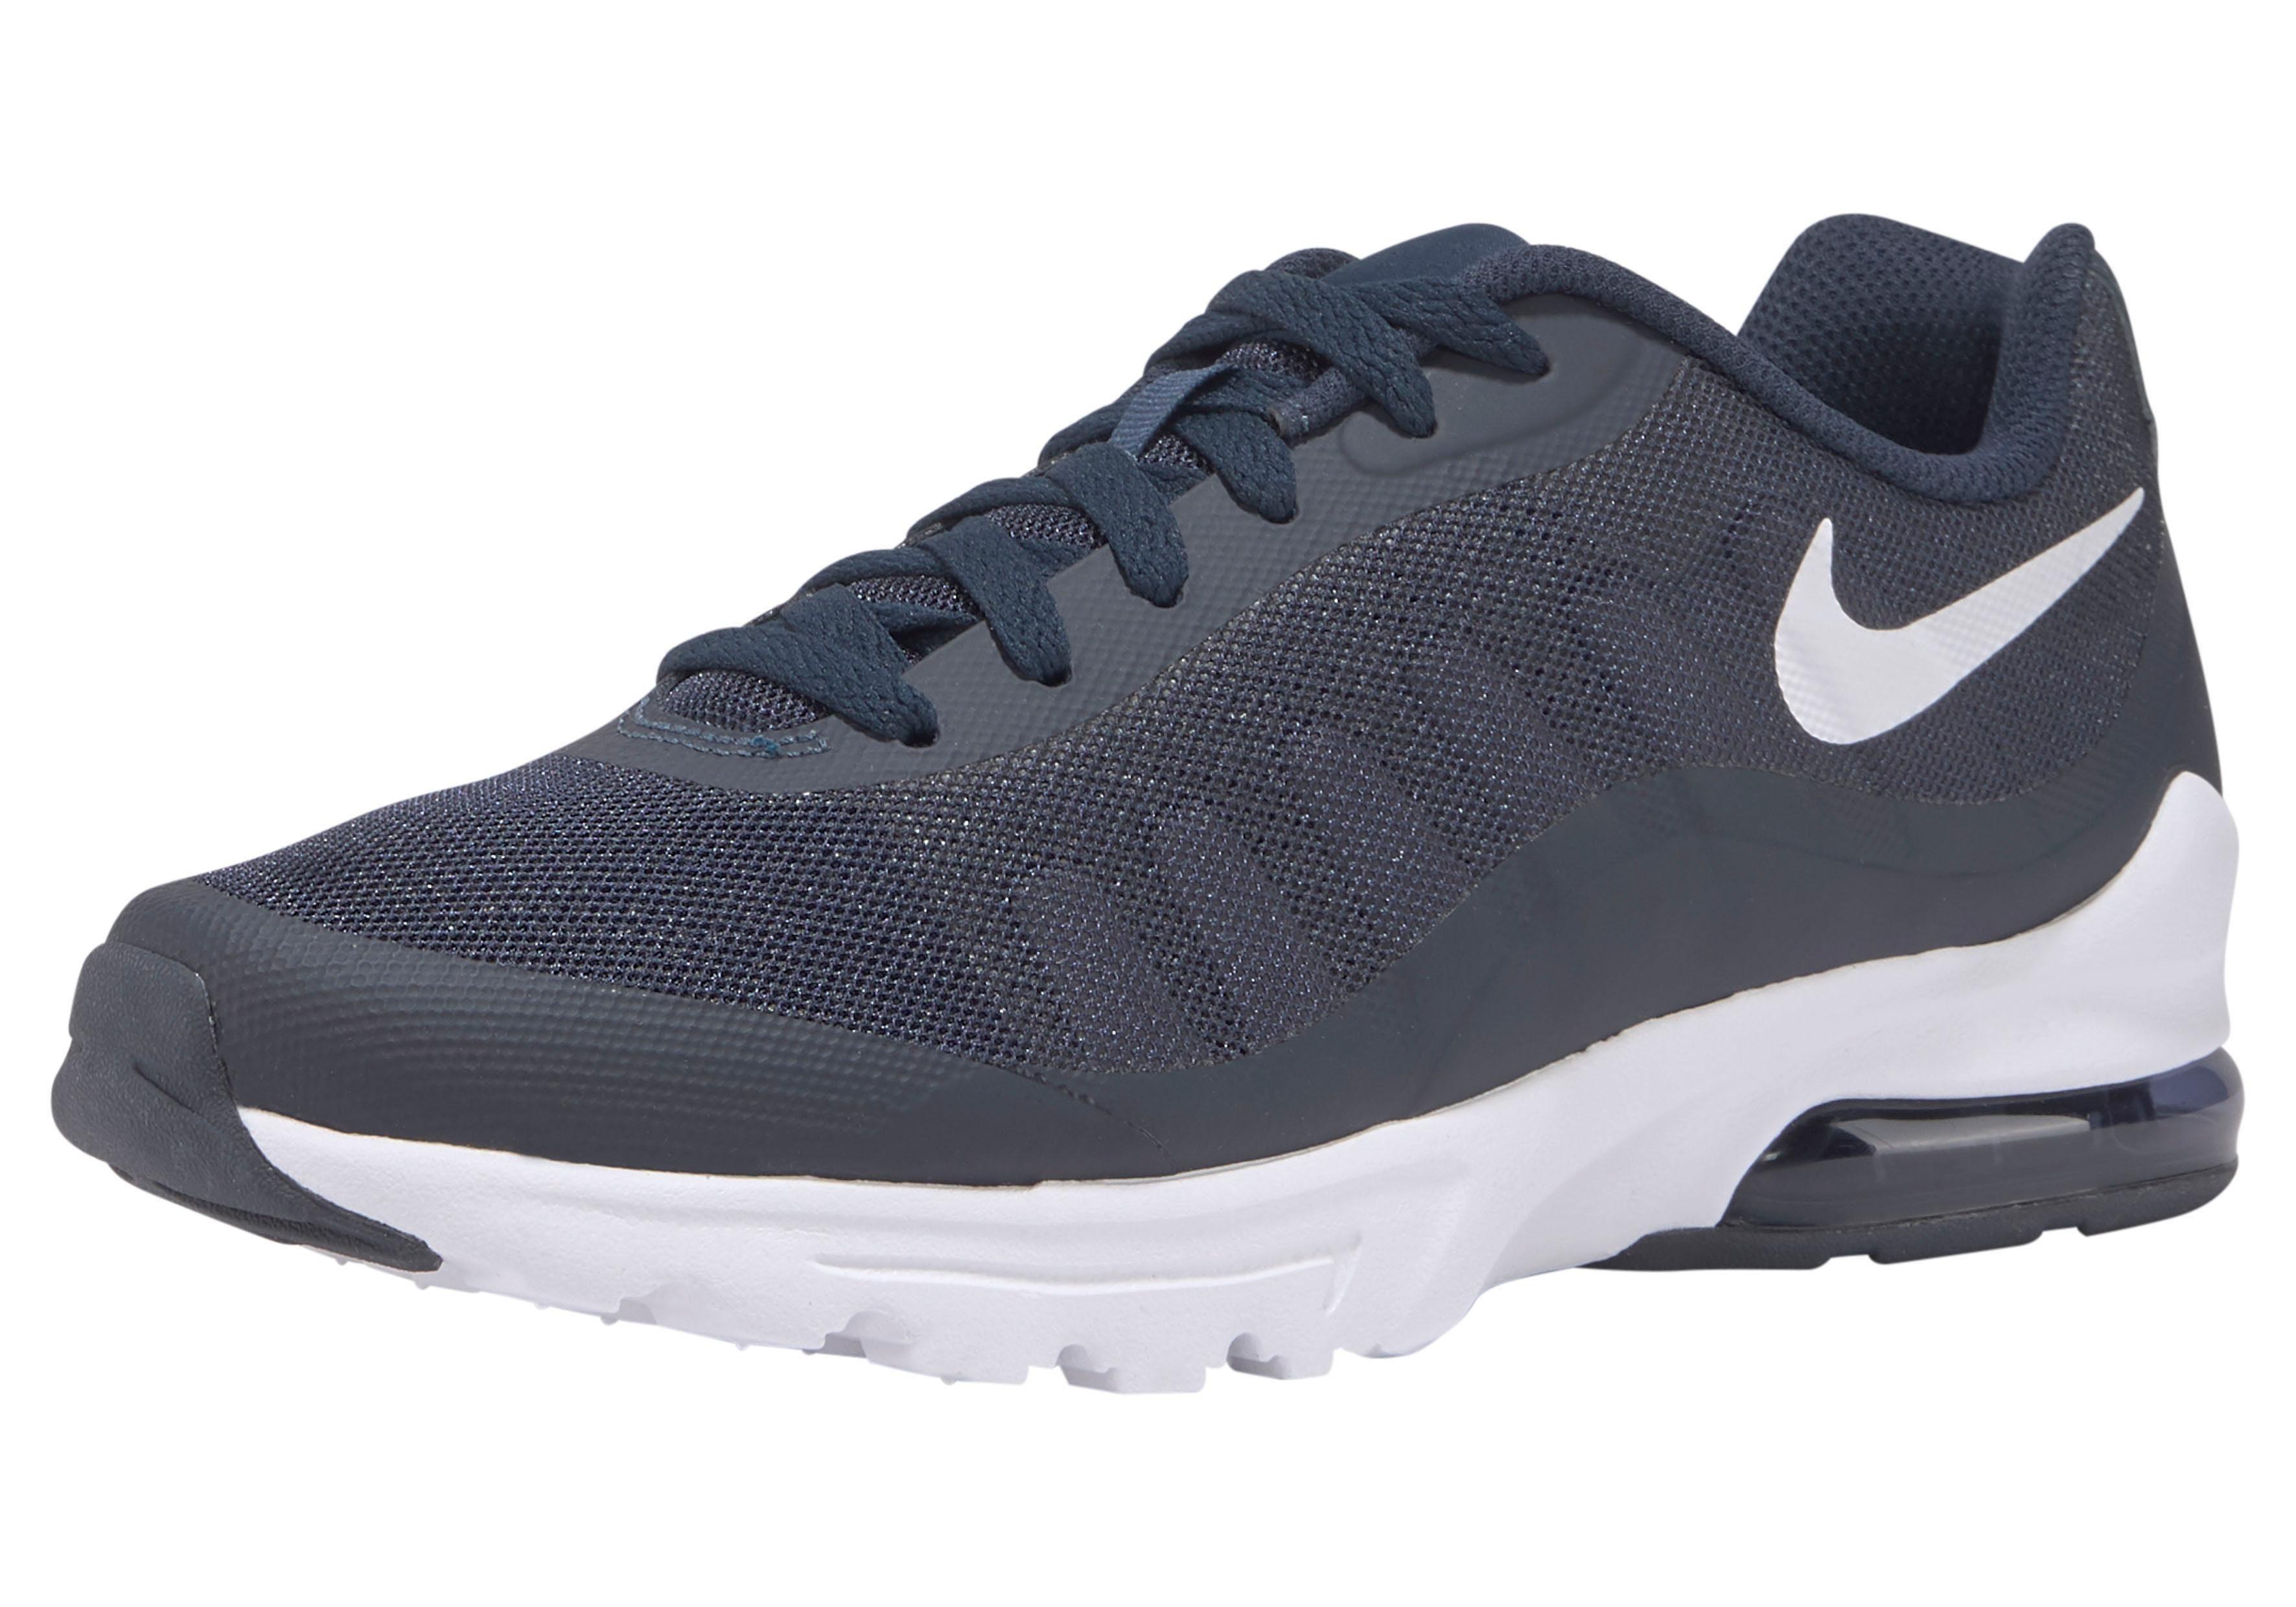 Nike Sportswear »Air Max Invigor« Sneaker, Atmungsaktives Mesh Obermaterial online kaufen | OTTO